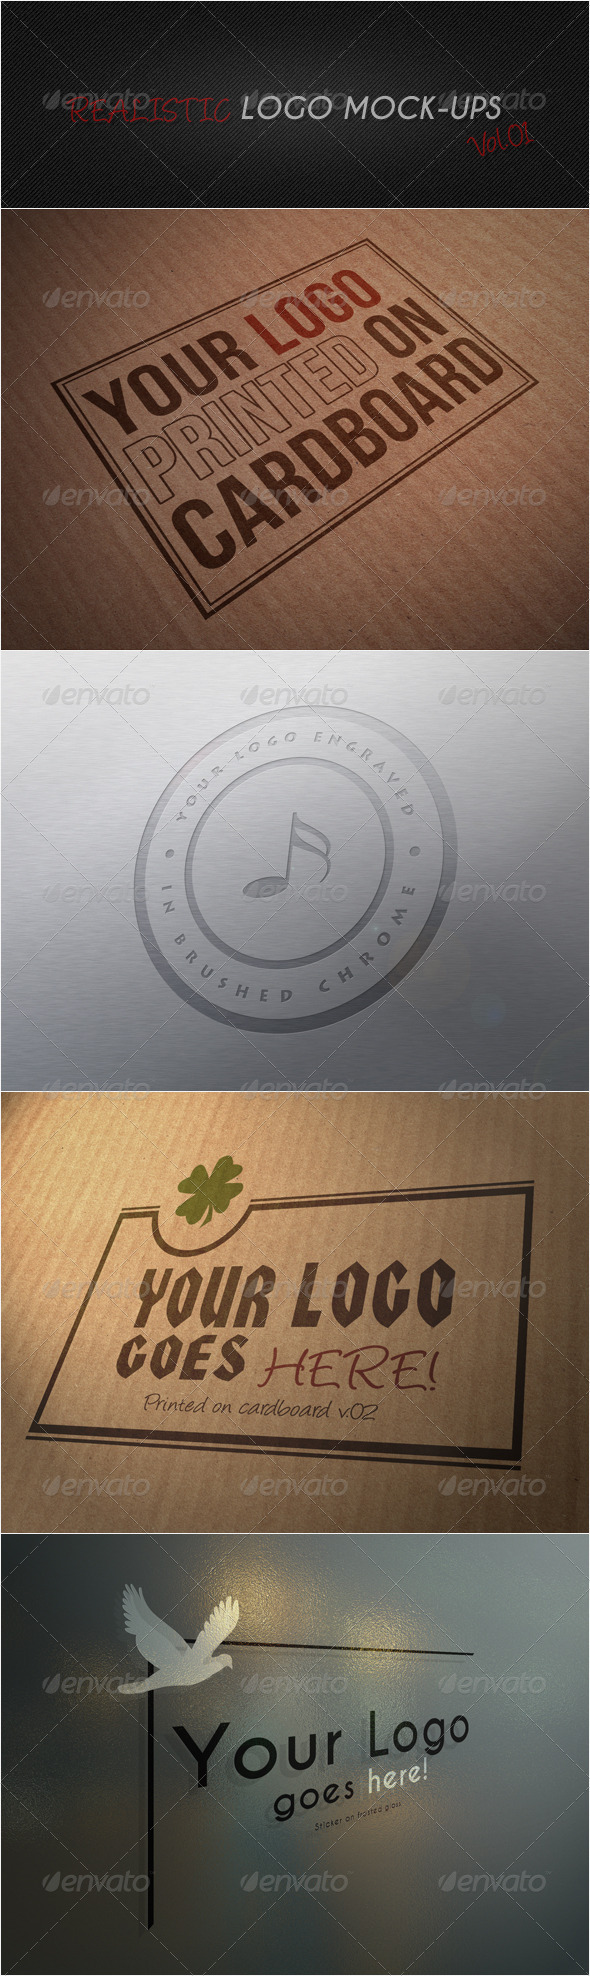 GraphicRiver Realistic Logo Mock-ups Vol.01 3272778